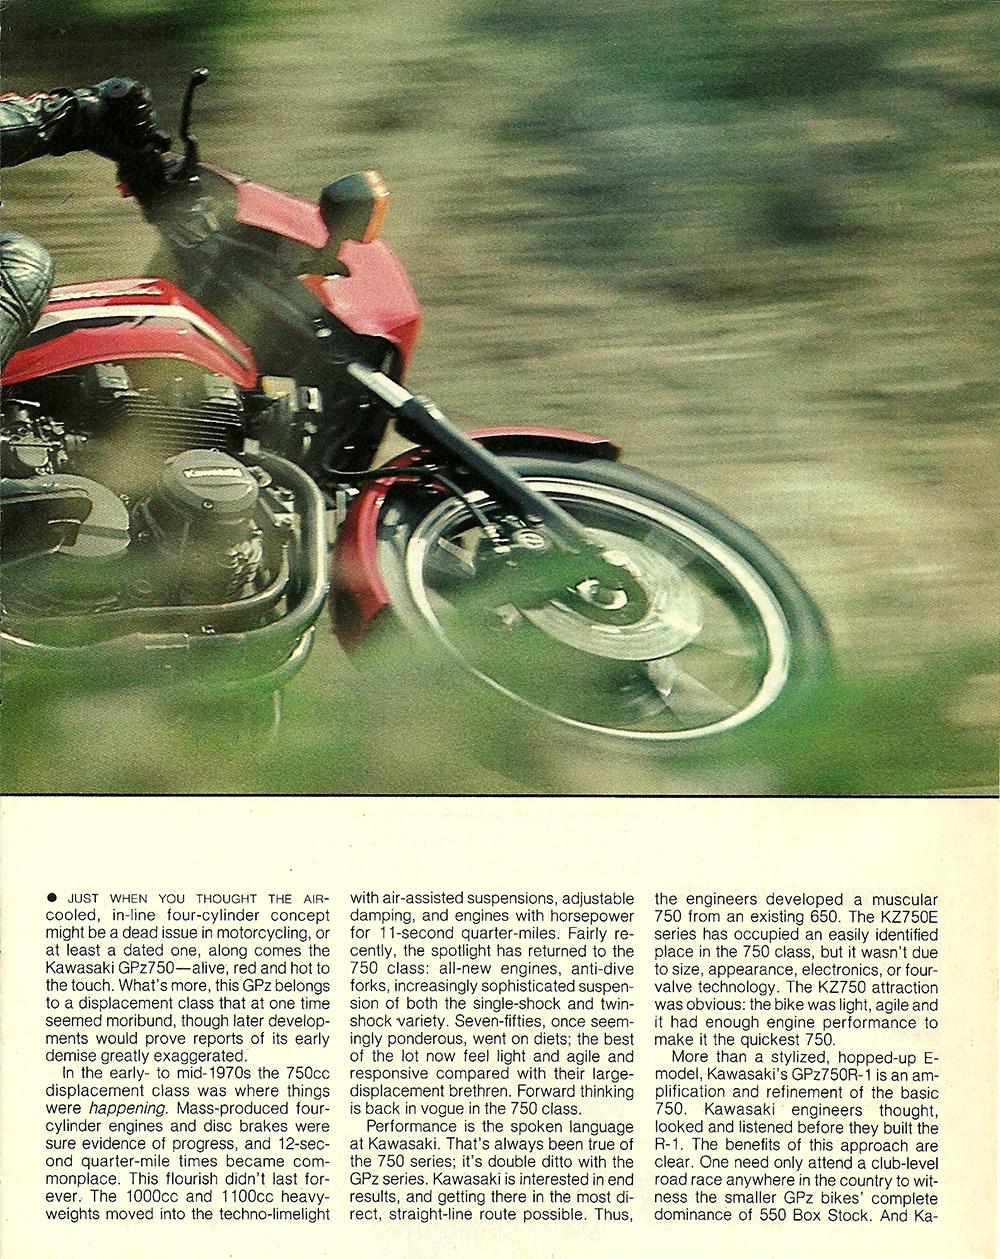 1982 Kawasaki Gpz750 road test 02.jpg